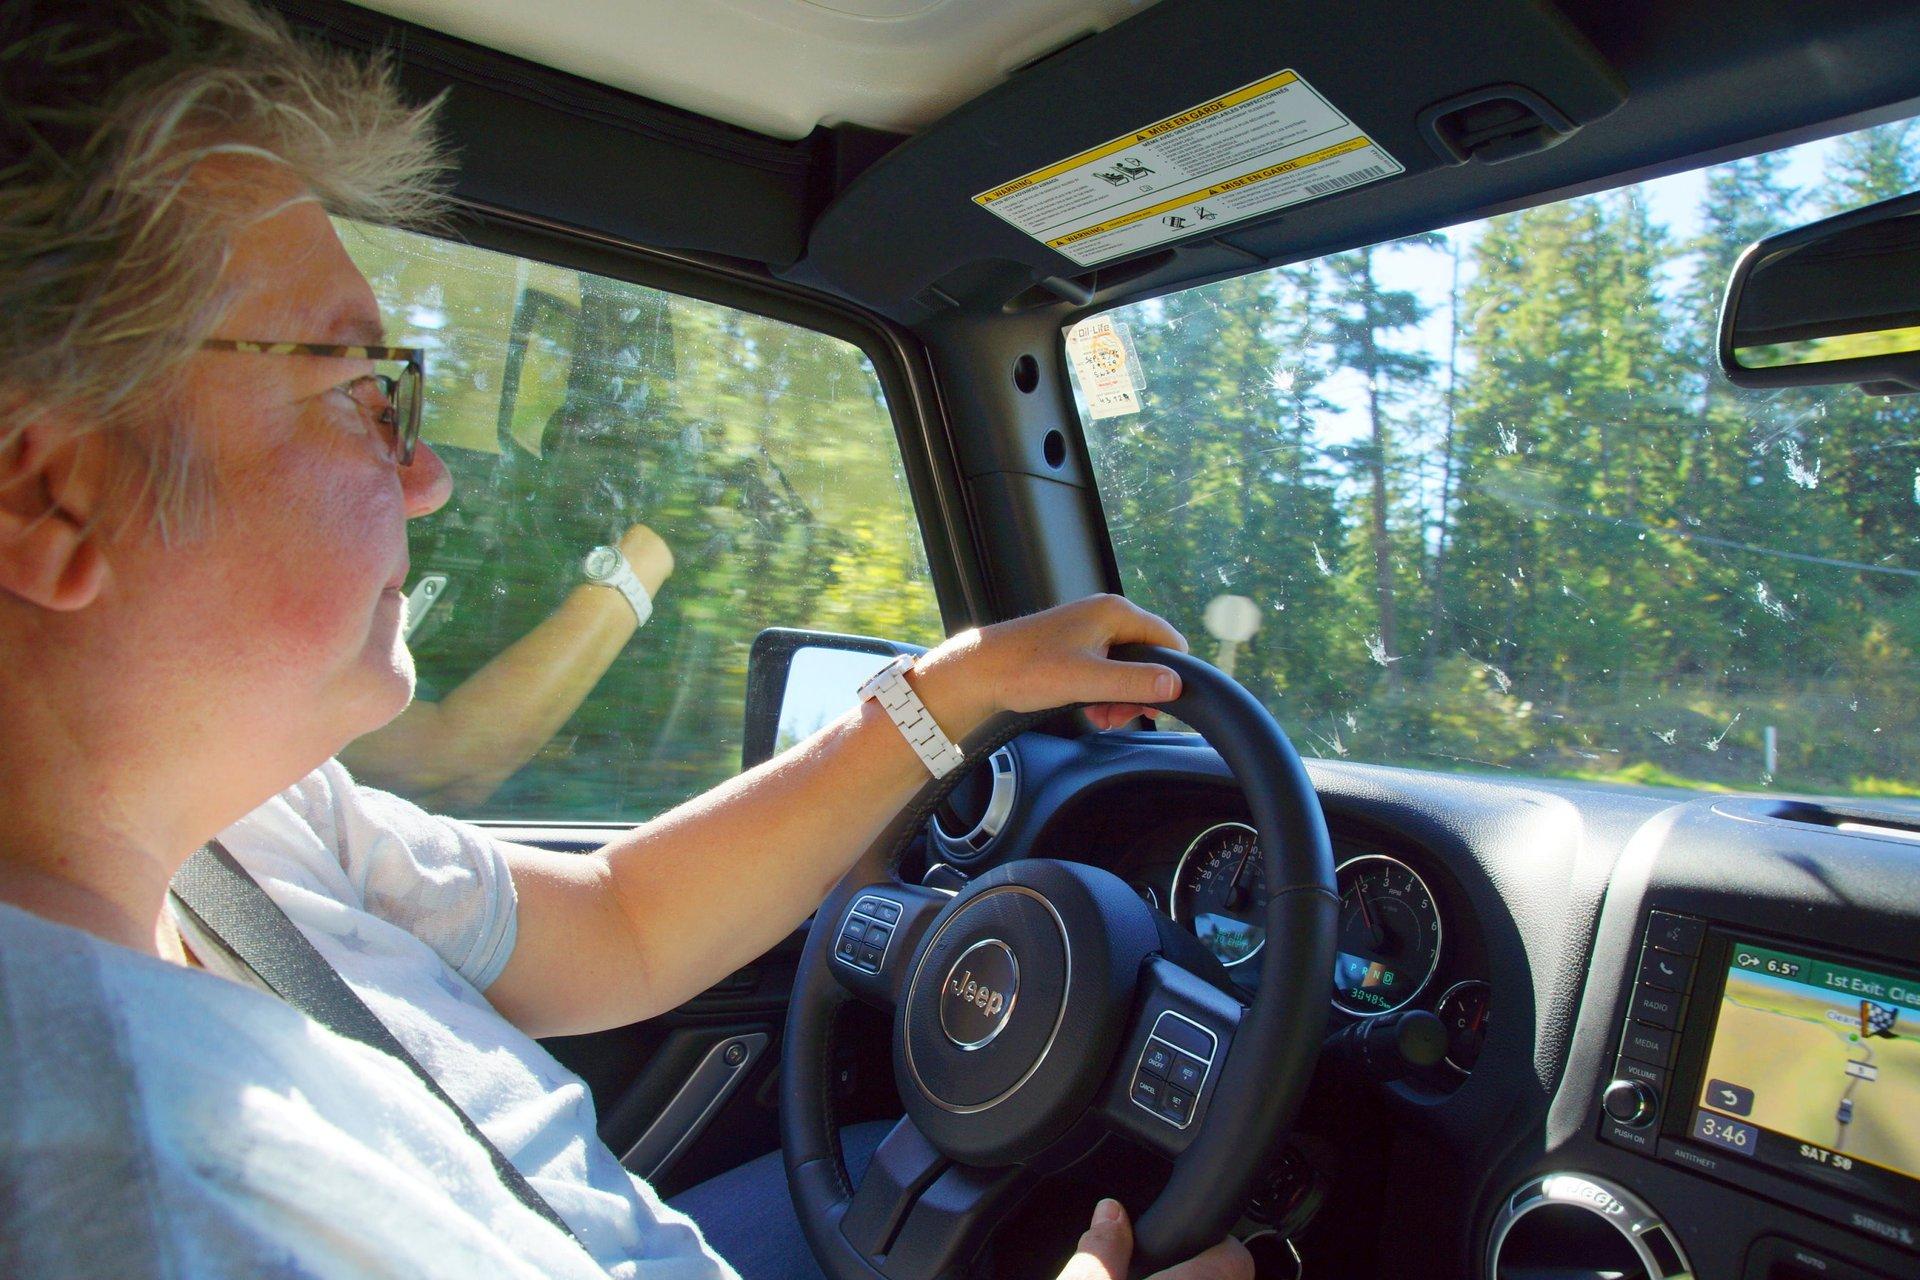 A woman drives a Jeep Wrangler